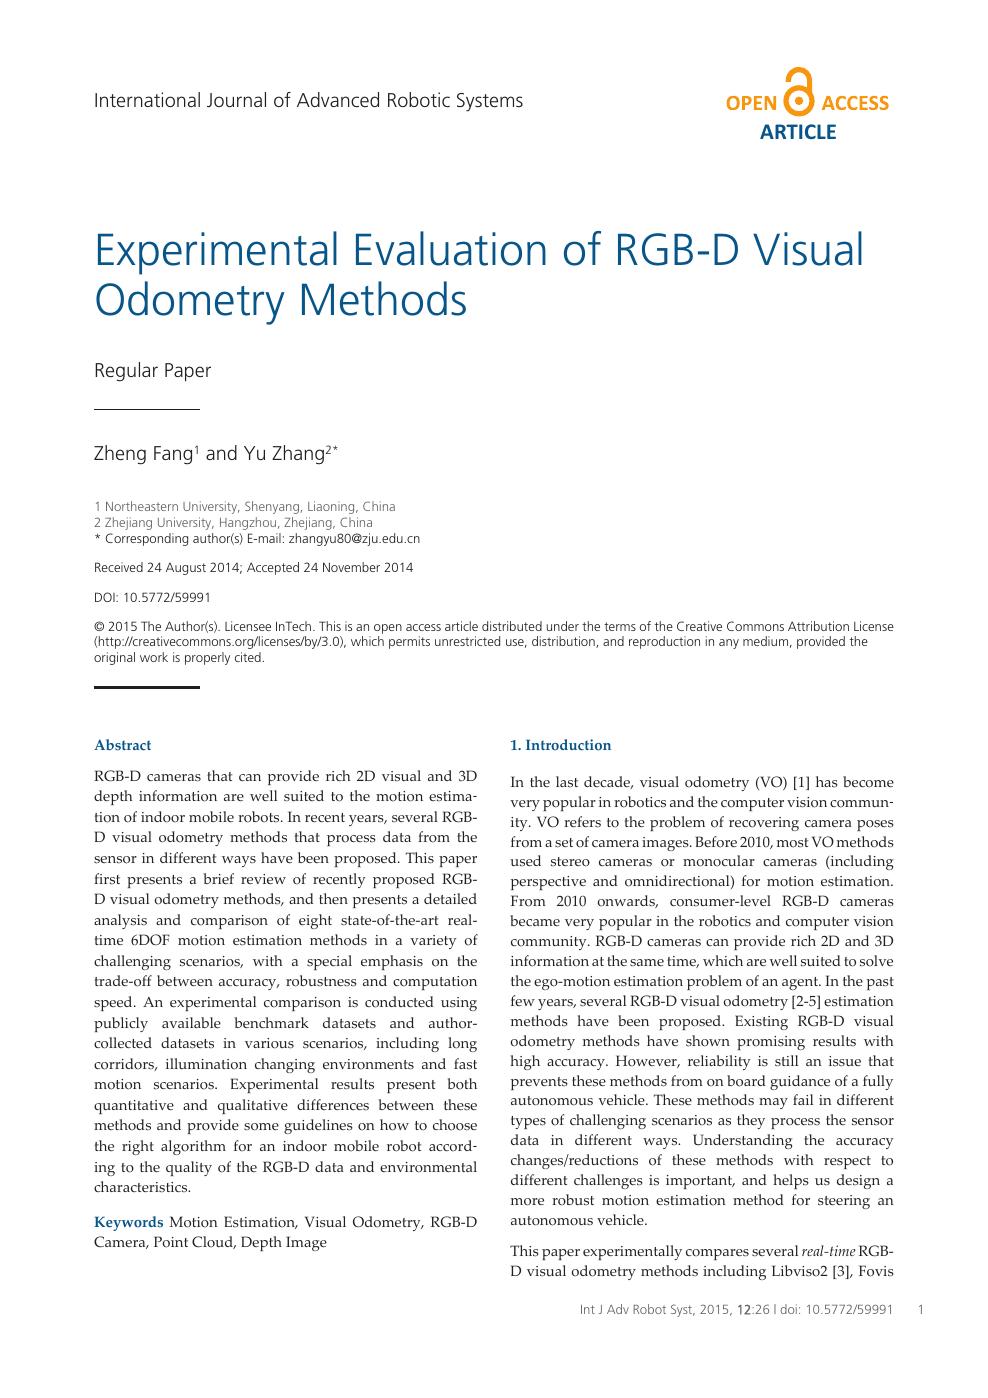 Experimental Evaluation of RGB-D Visual Odometry Methods